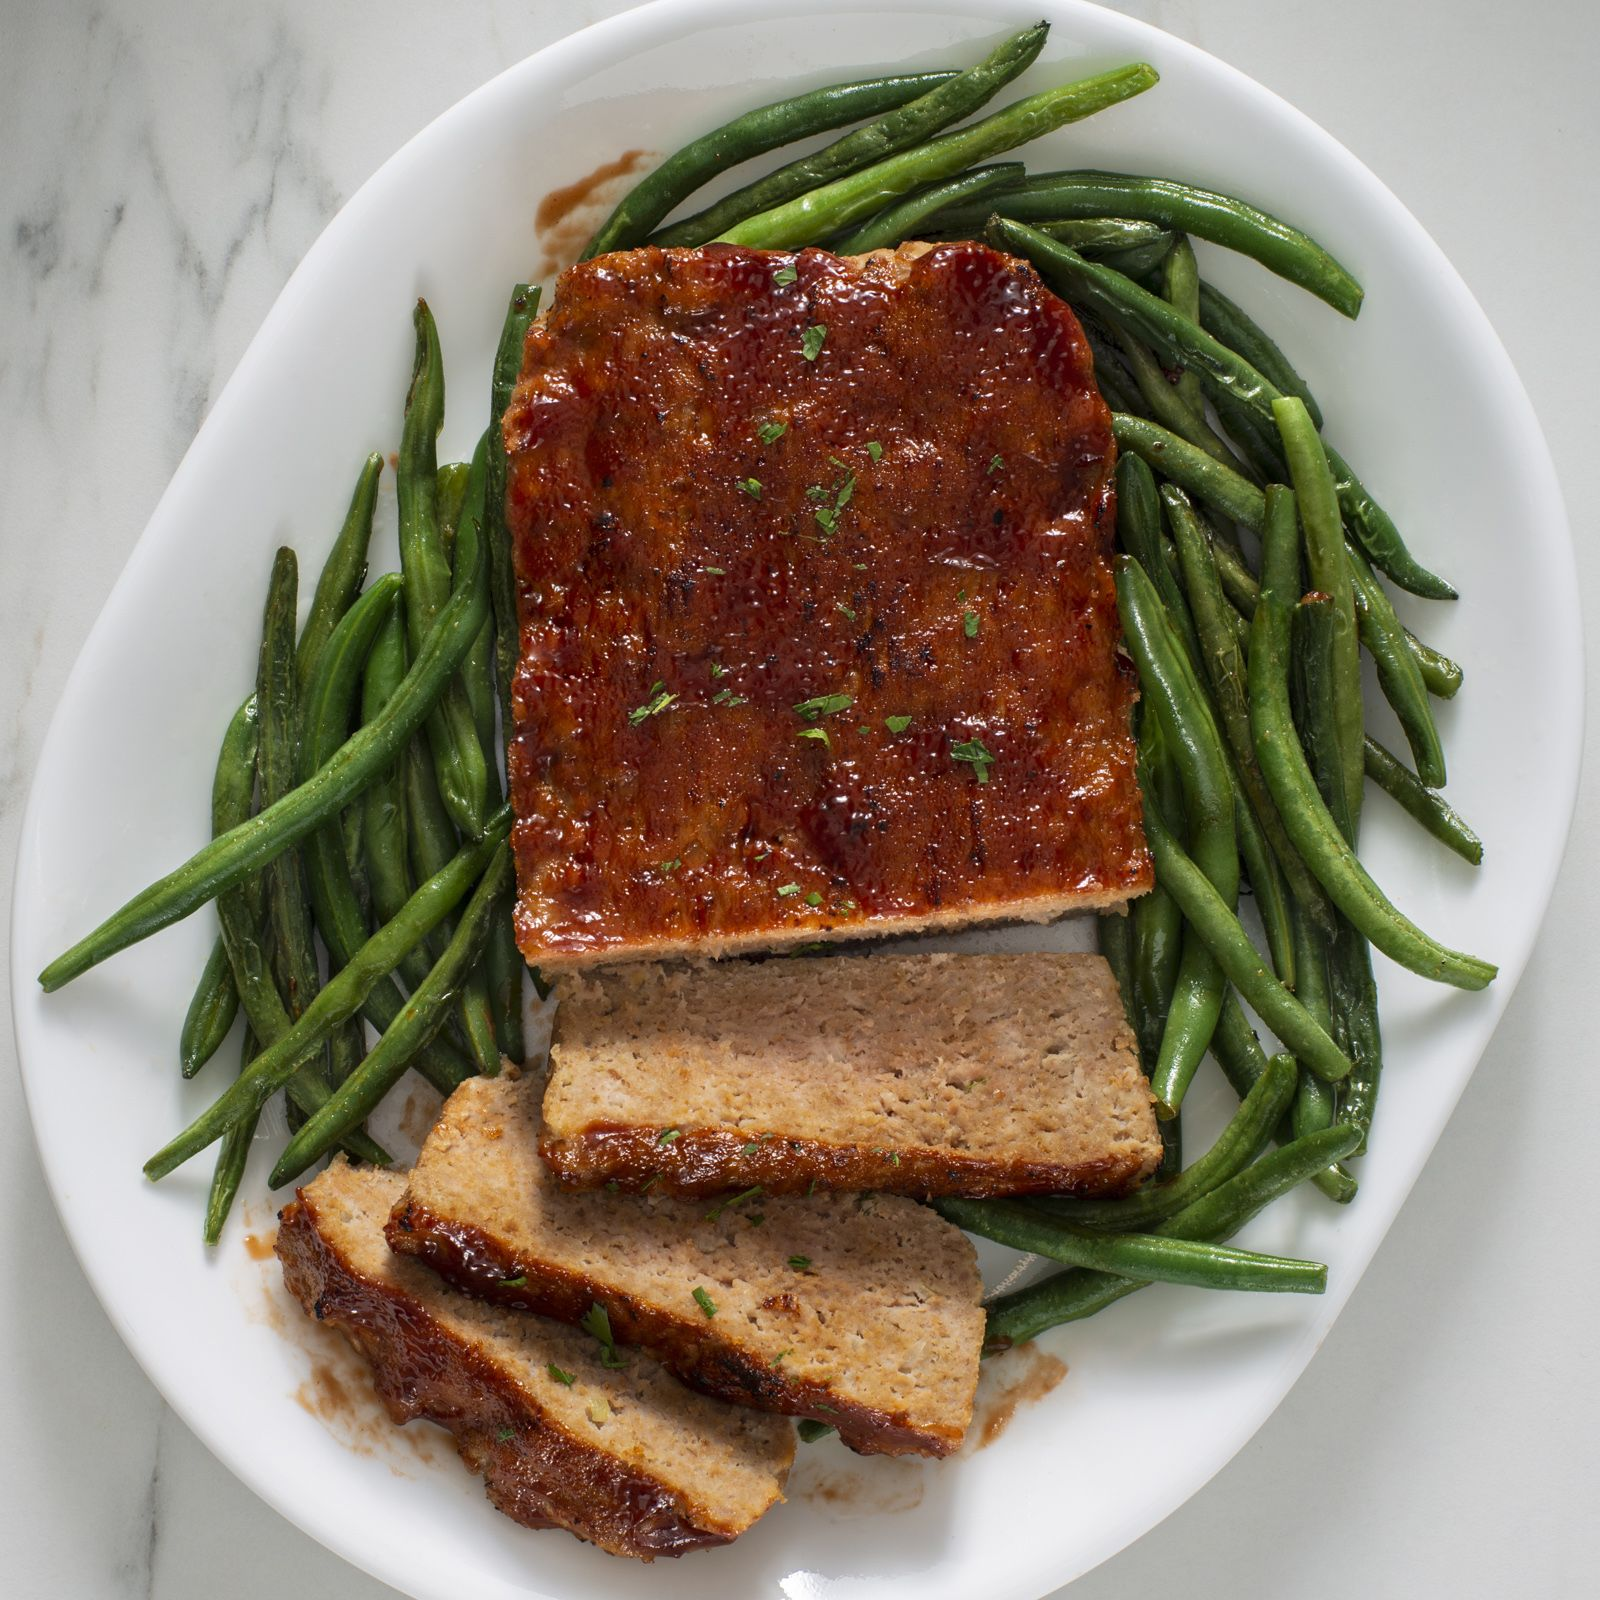 Duo Crisp Air Fryer Turkey Meatloaf And Green Beans Instant Pot Recipes Recipe Instant Pot Recipes Pot Recipes Turkey Meatloaf